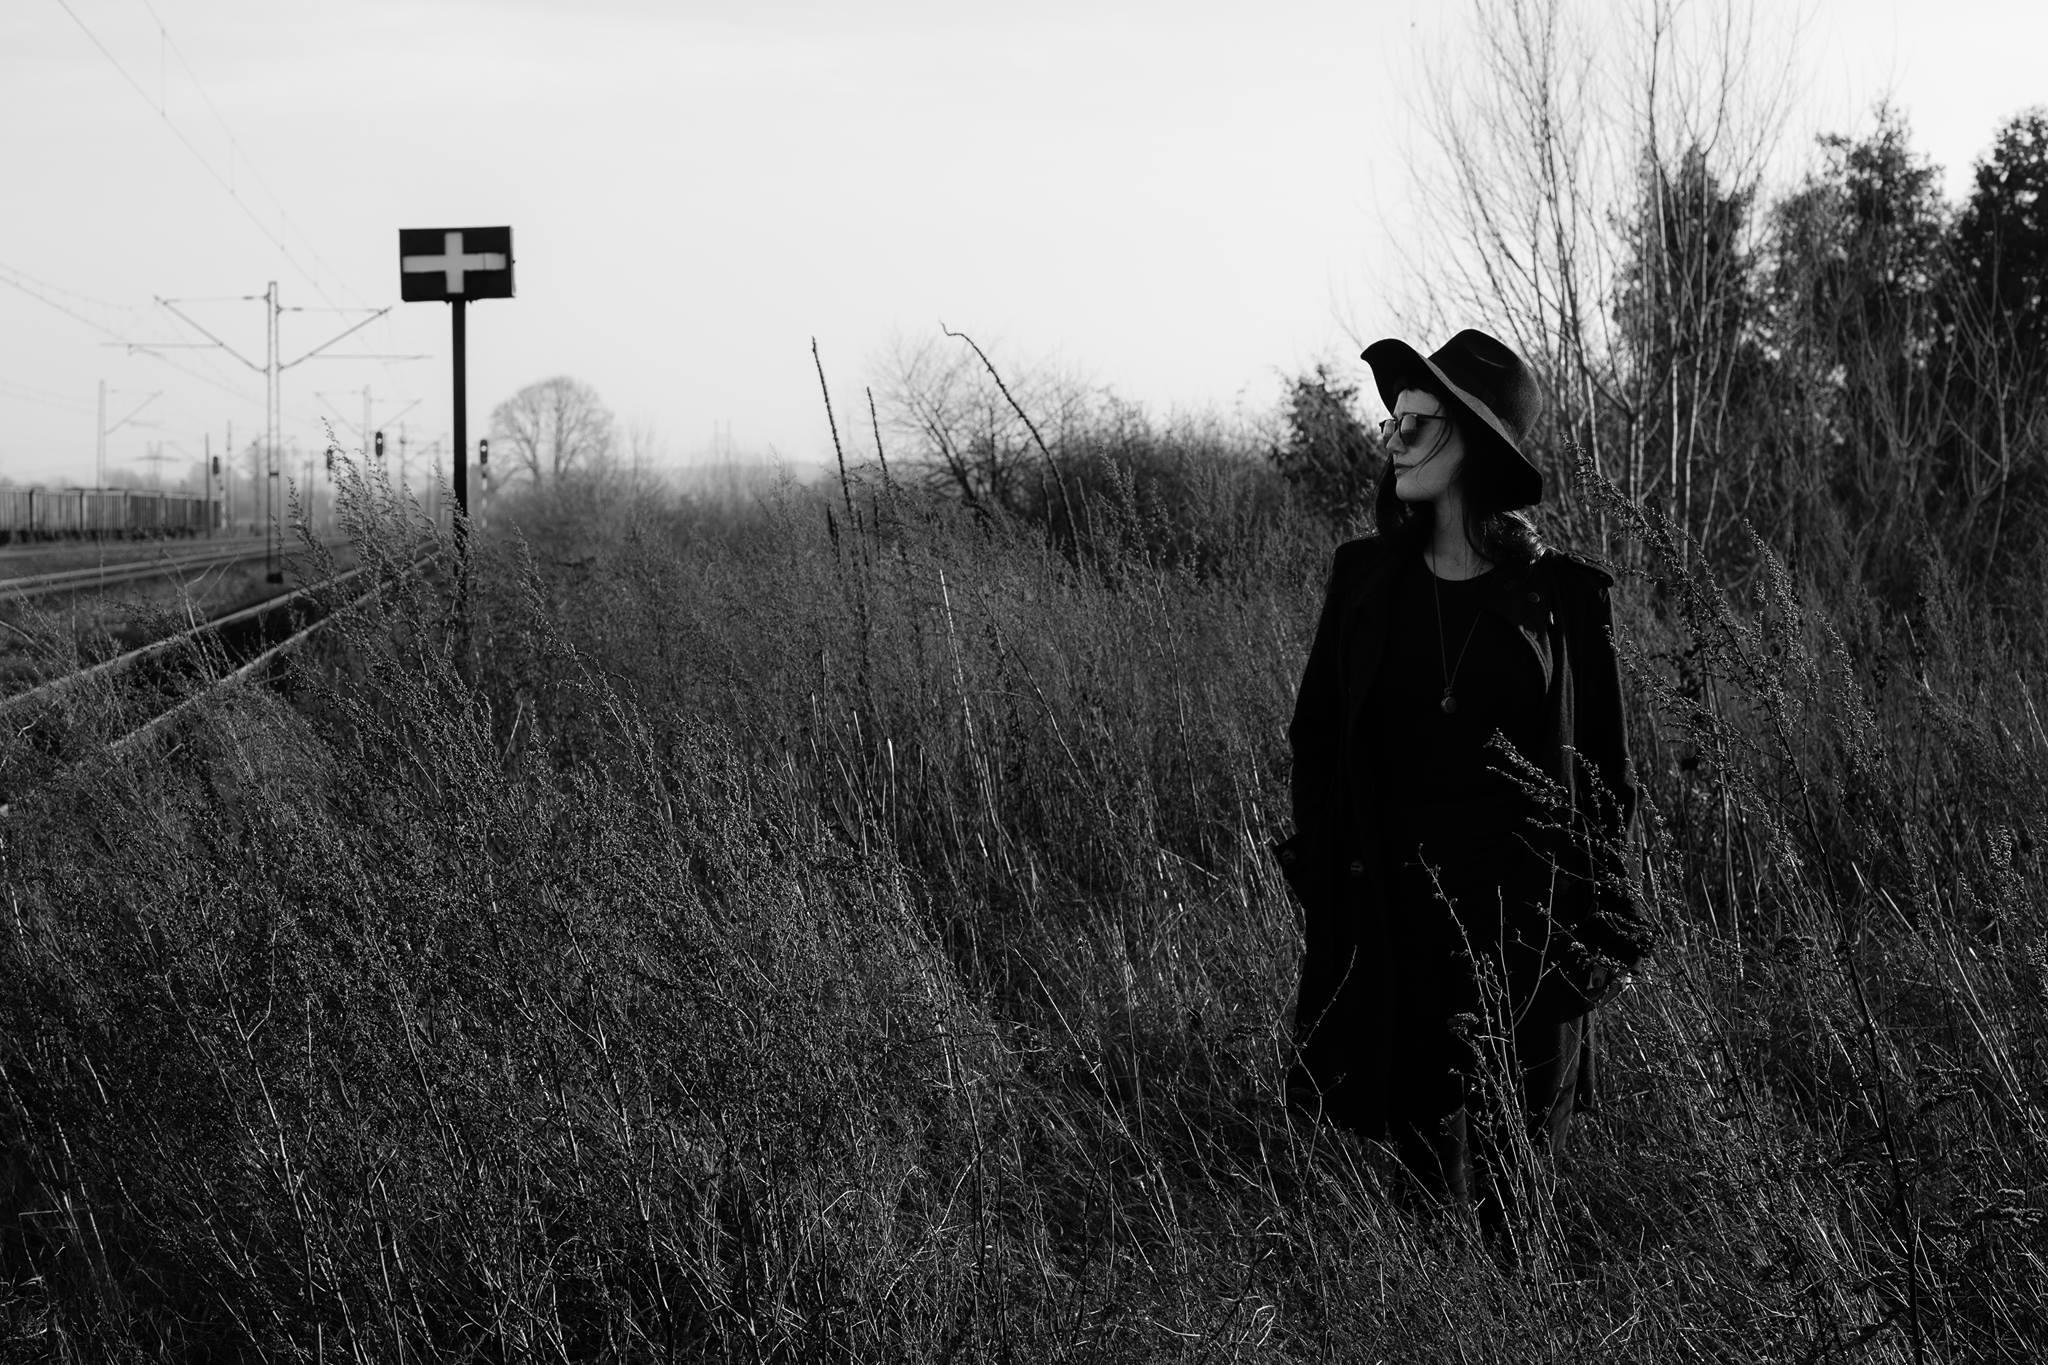 Moriah Woods Trio (USA/Pl) – aksamitny, ciemny, polsko-amerykański projekt